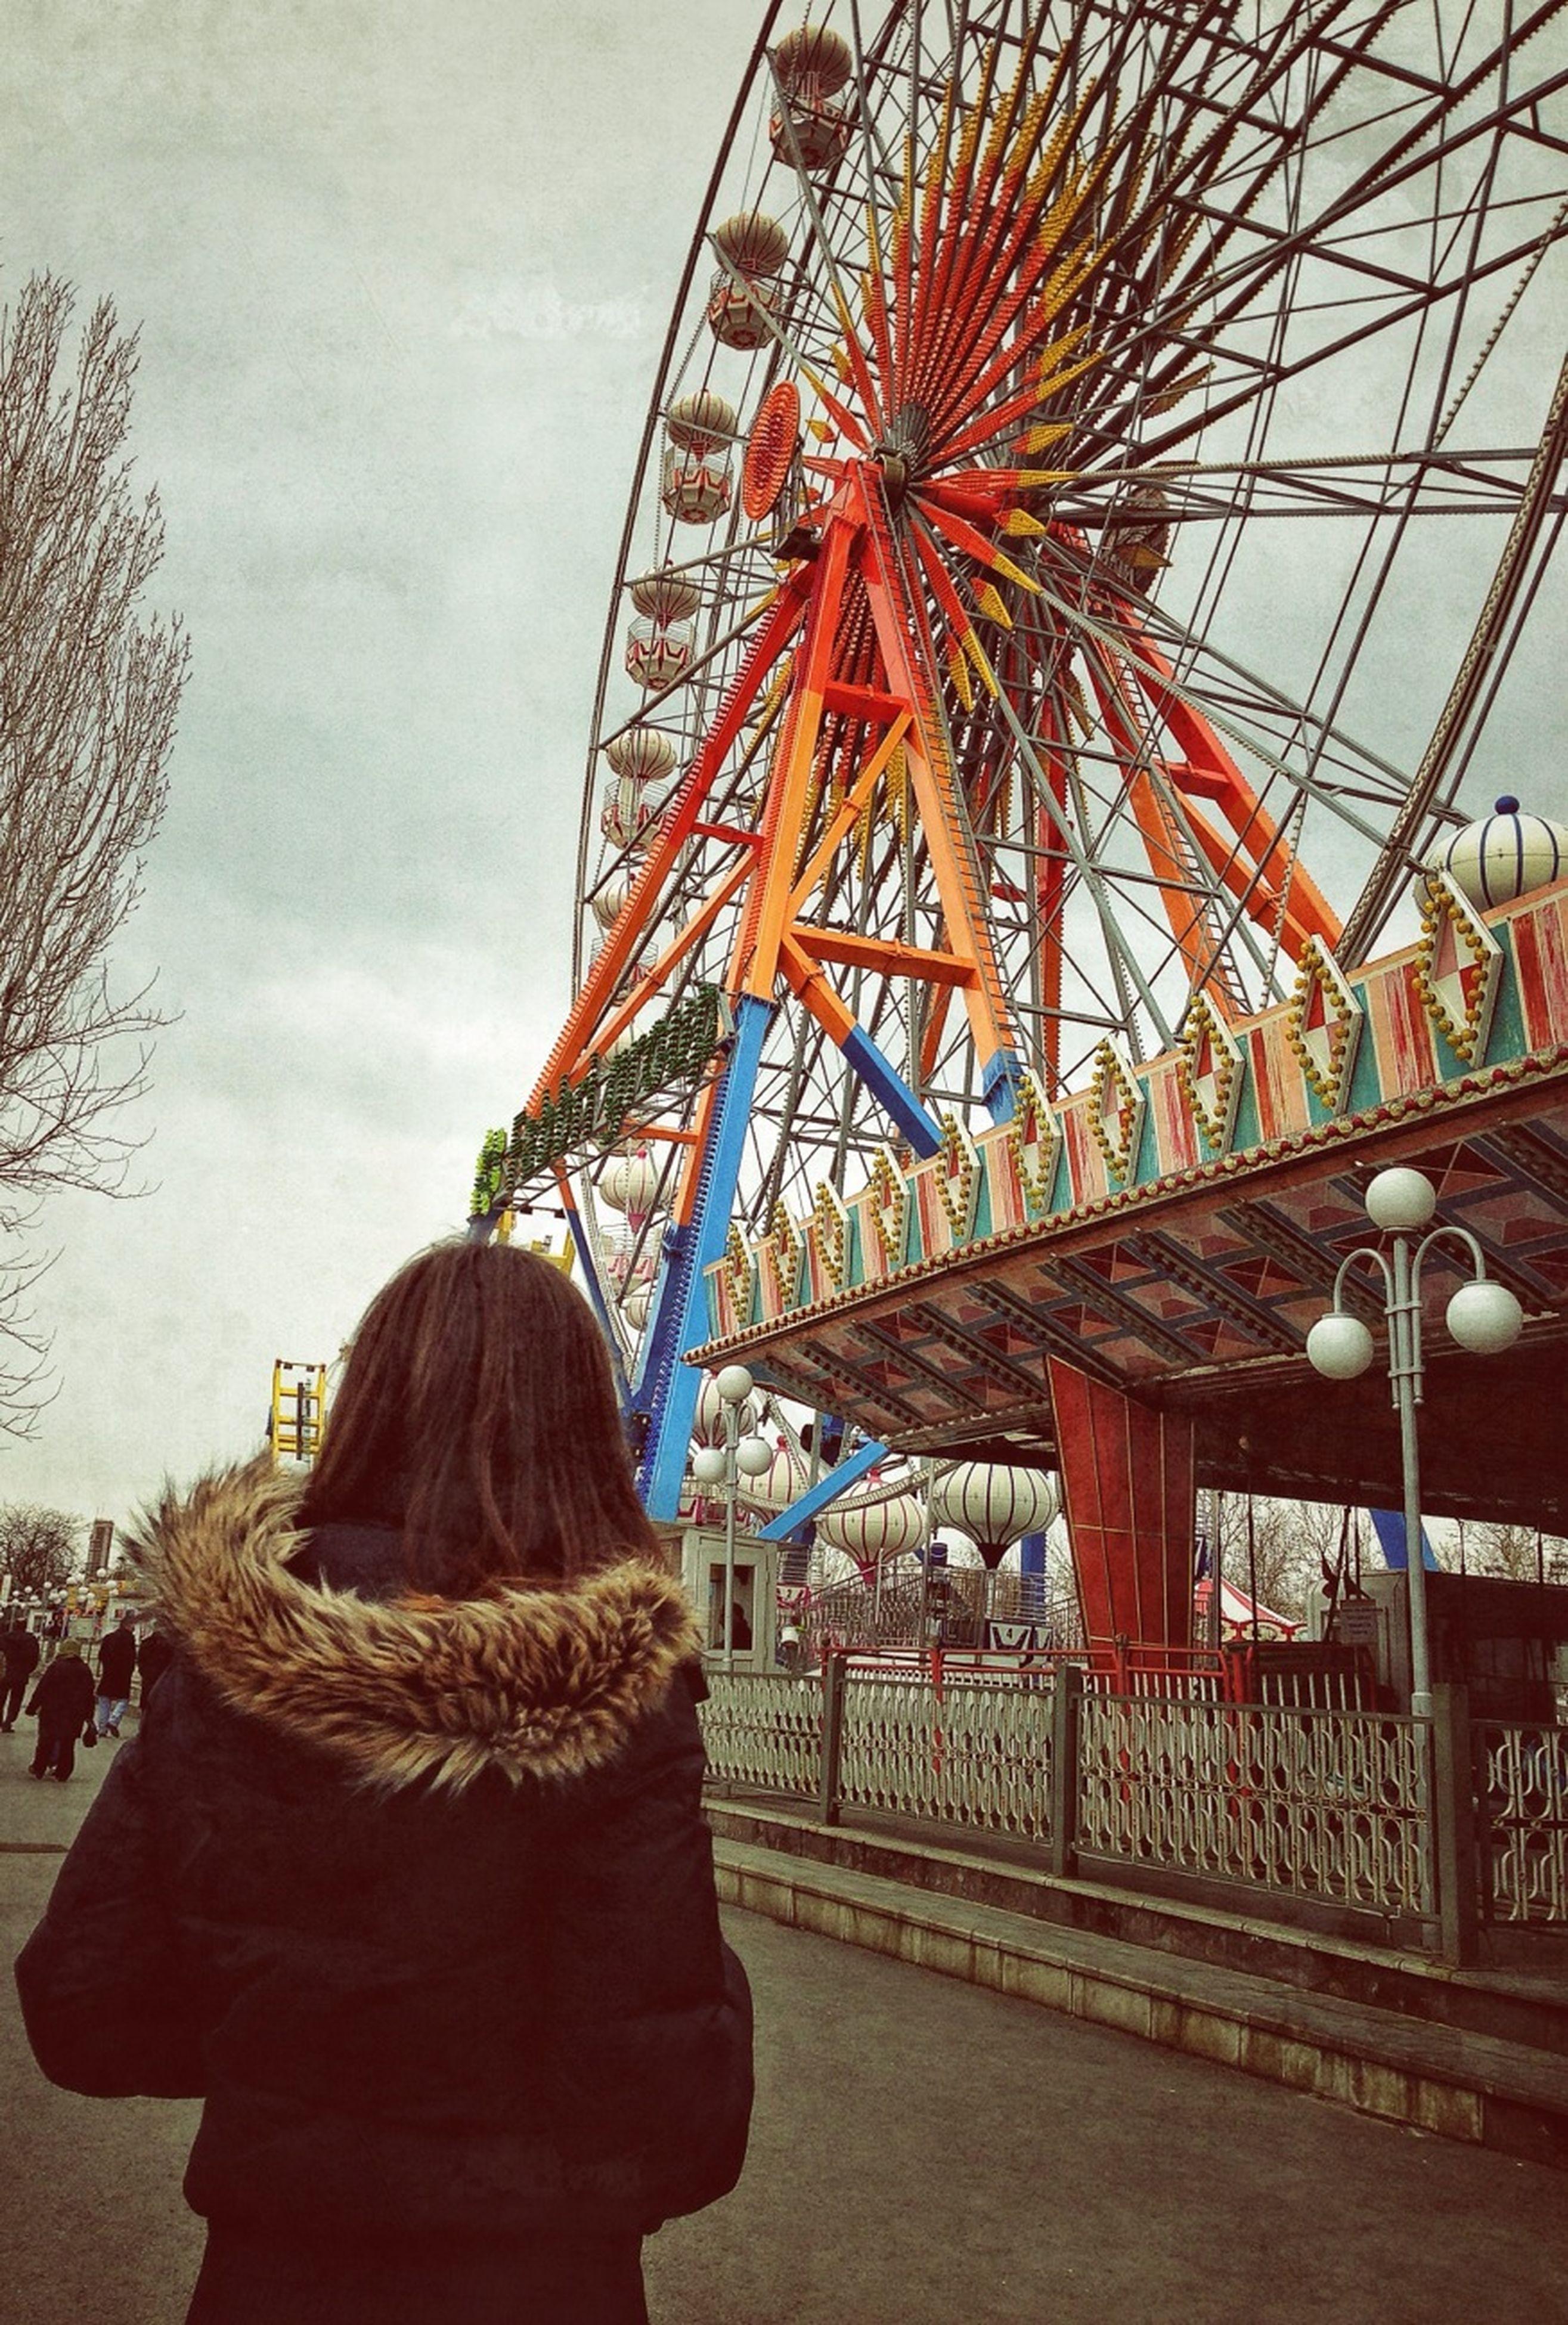 sky, leisure activity, lifestyles, amusement park, arts culture and entertainment, amusement park ride, person, rear view, cloud - sky, men, ferris wheel, built structure, architecture, standing, casual clothing, enjoyment, fun, low angle view